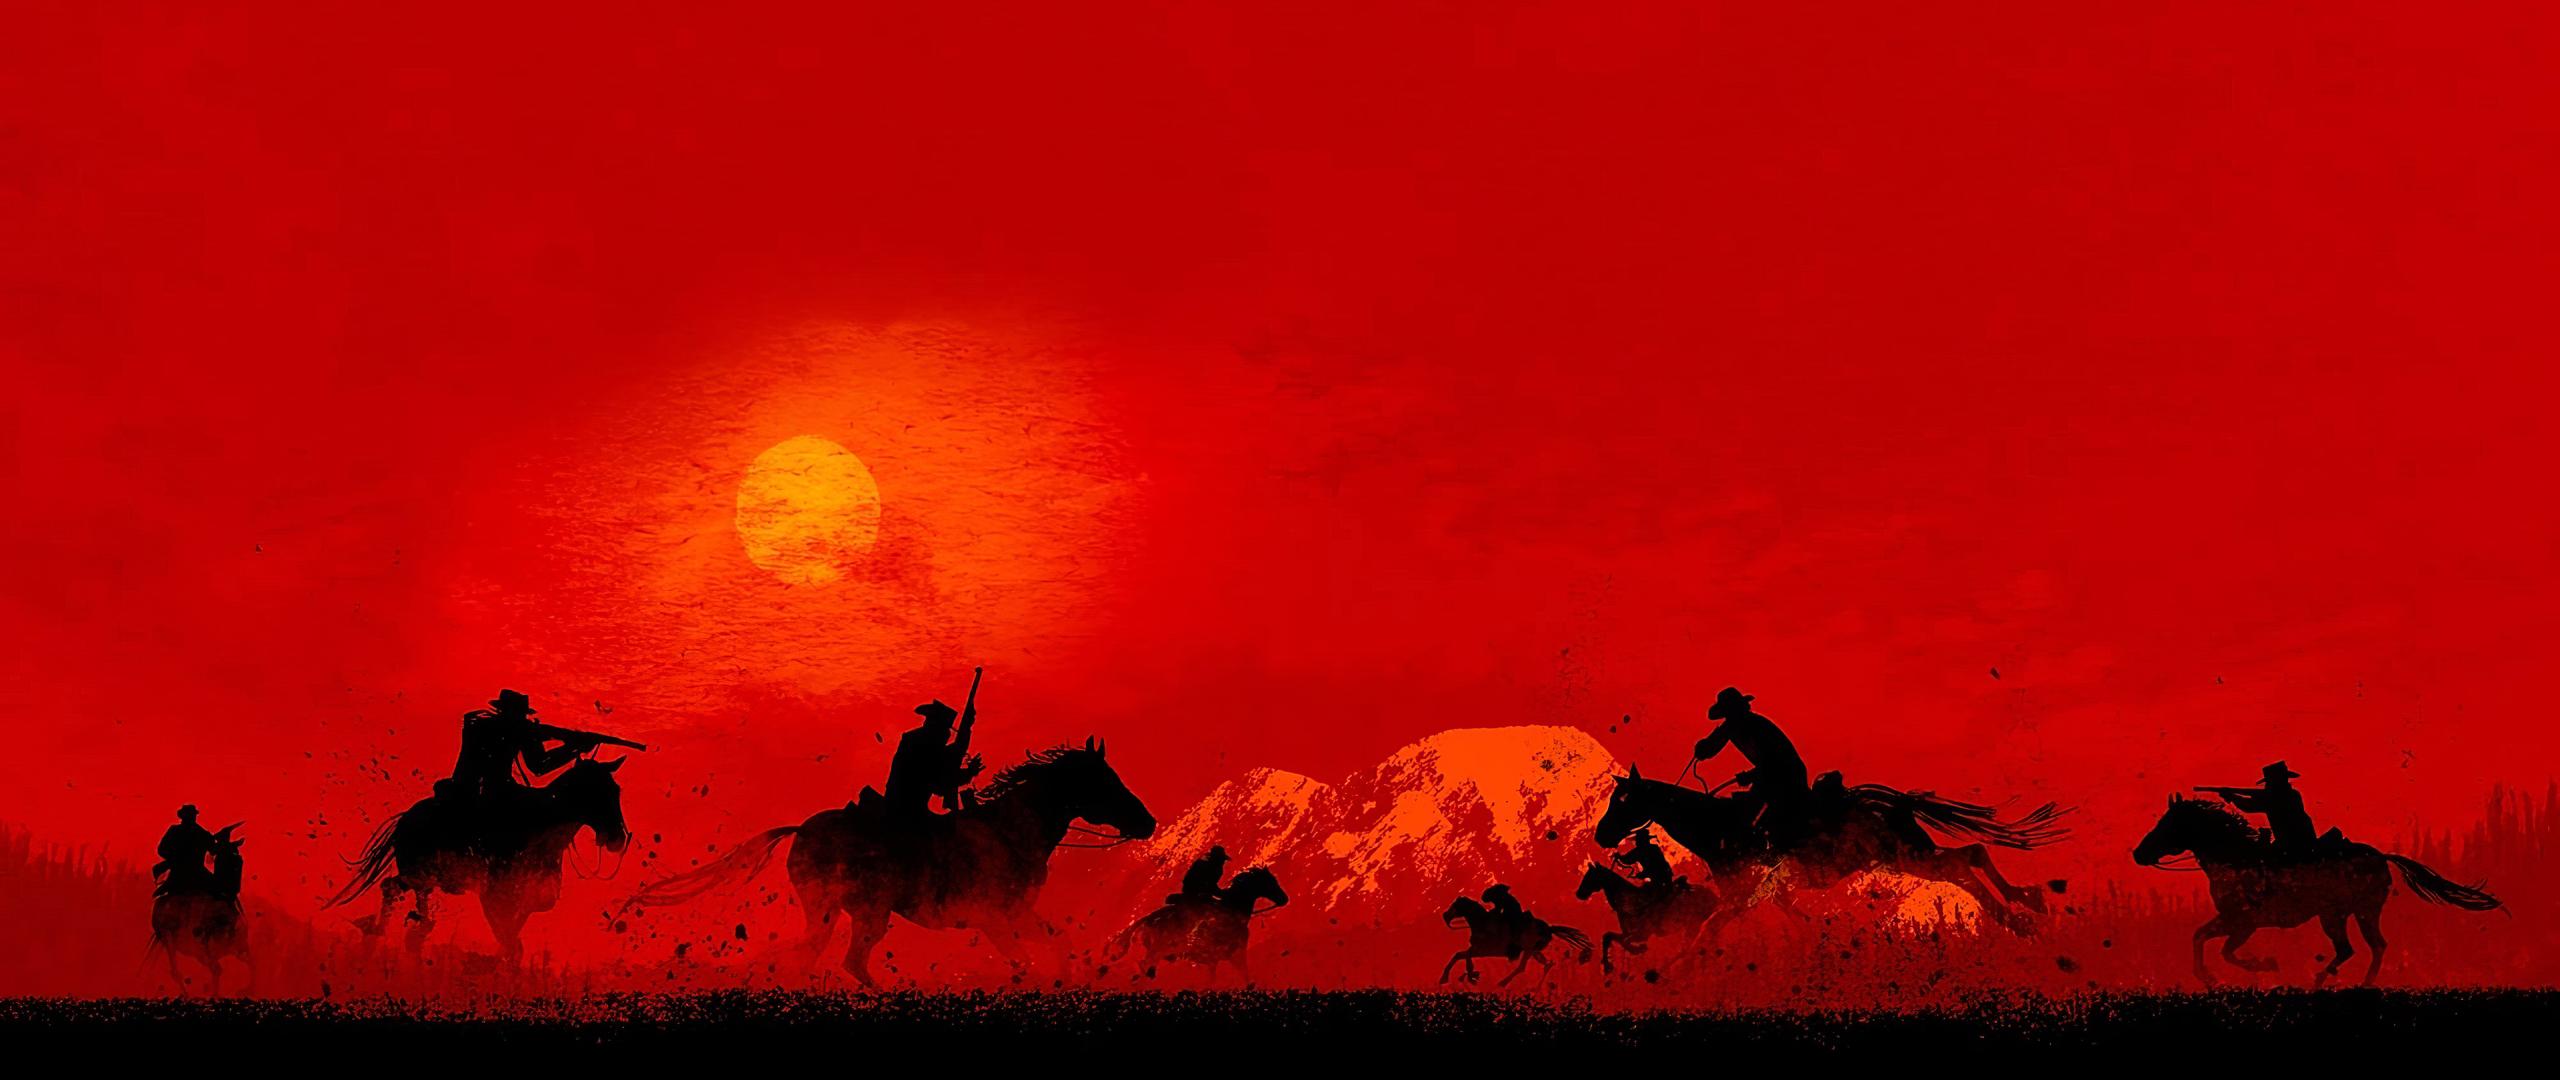 2560x1080 Red Dead Redemption 2 Game 2019 2560x1080 Resolution